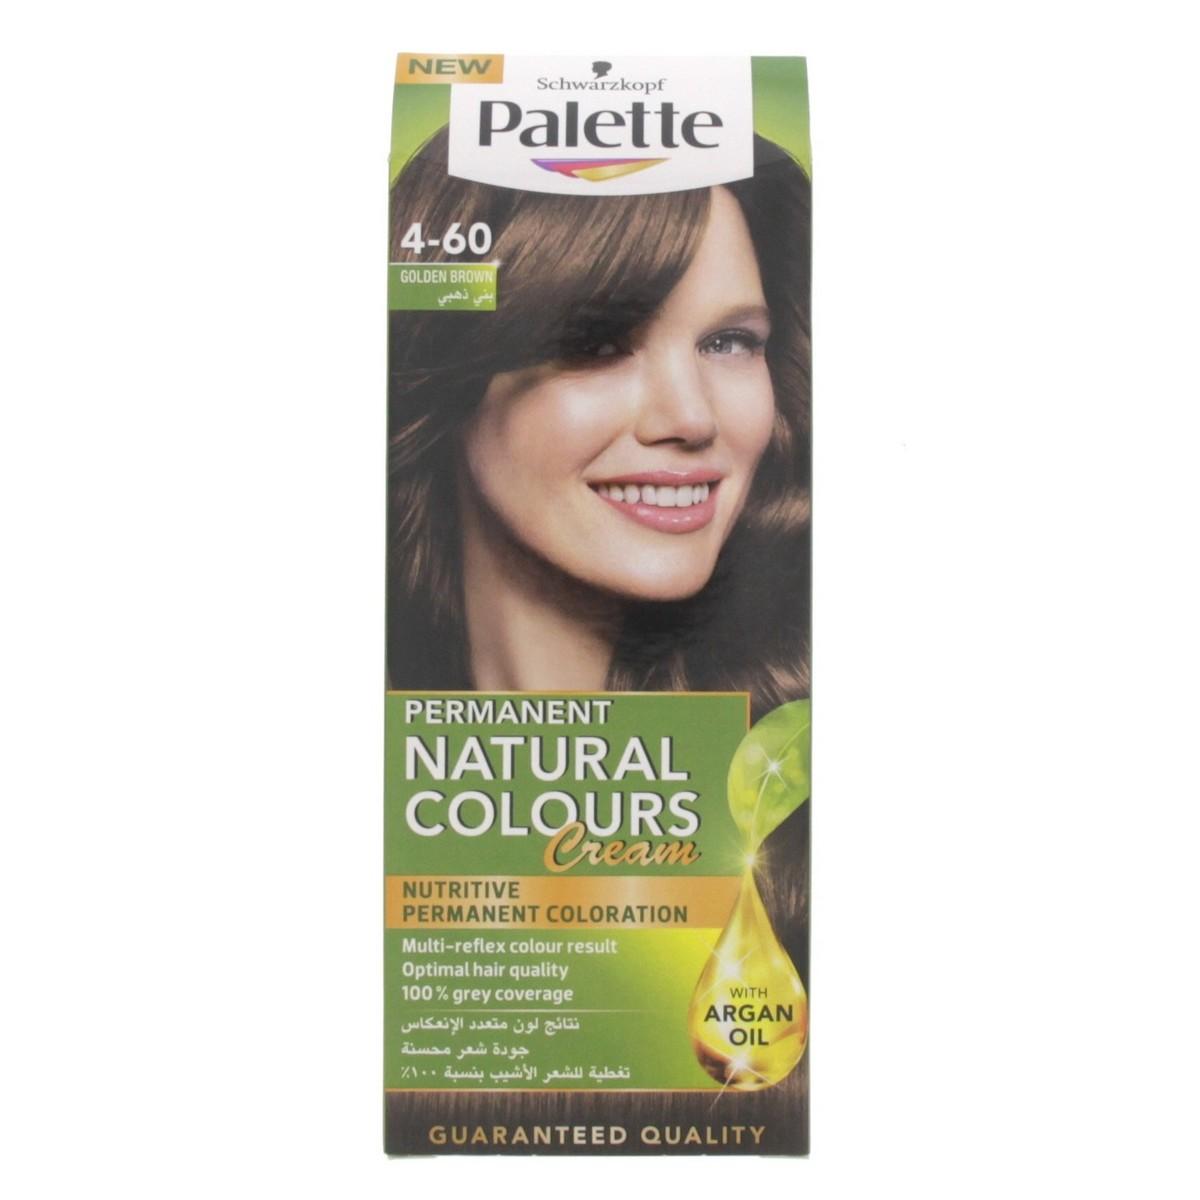 Buy Palette Permanent Natural Color Cream Golden Brown 4-60